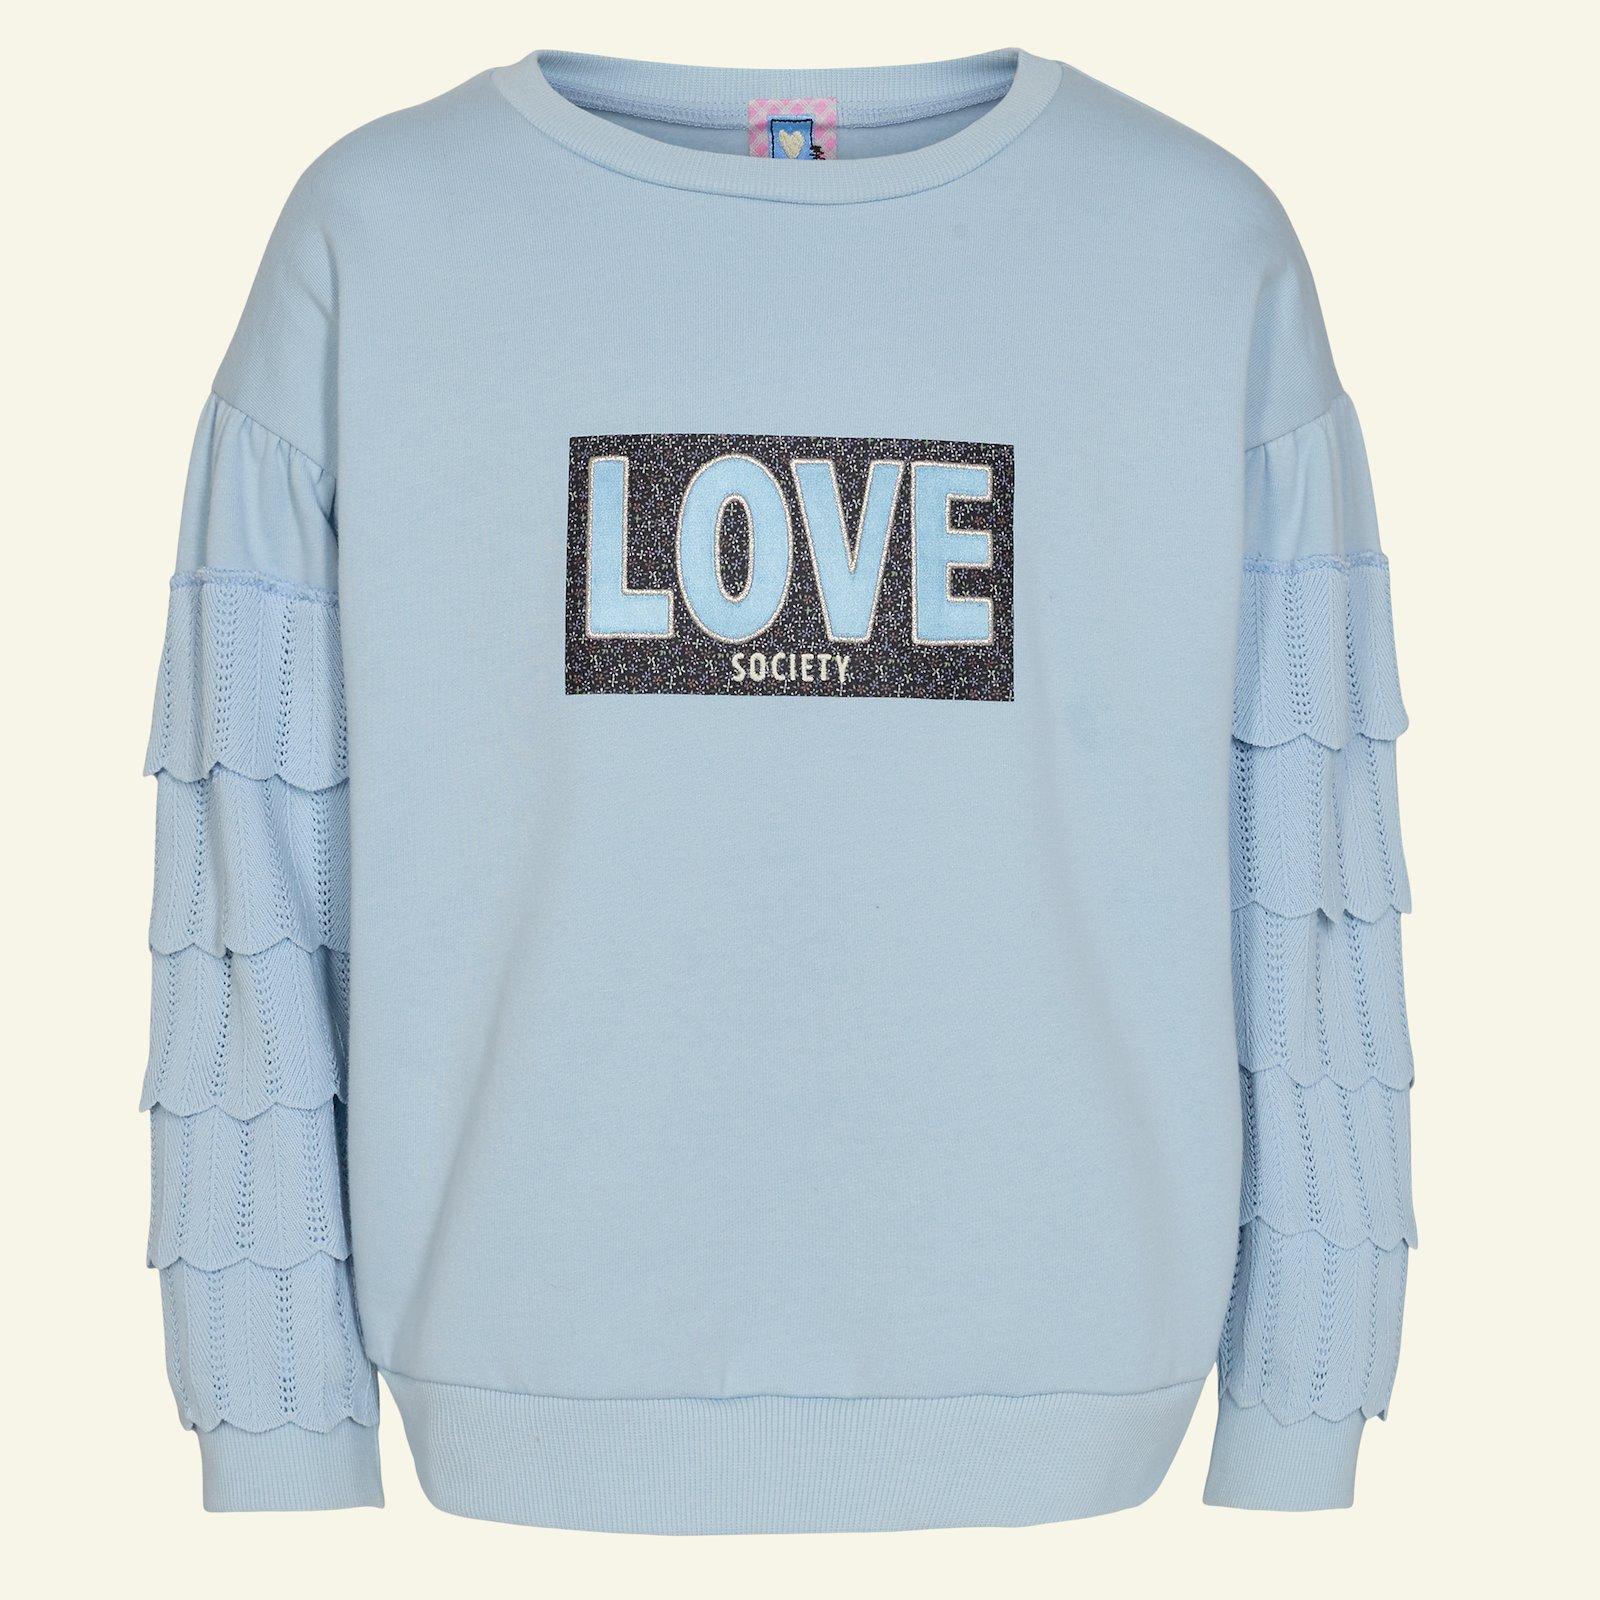 Sweatshirt w. hood + pocket, 134/9y p62020_211777_272668_96136_26525_sskit